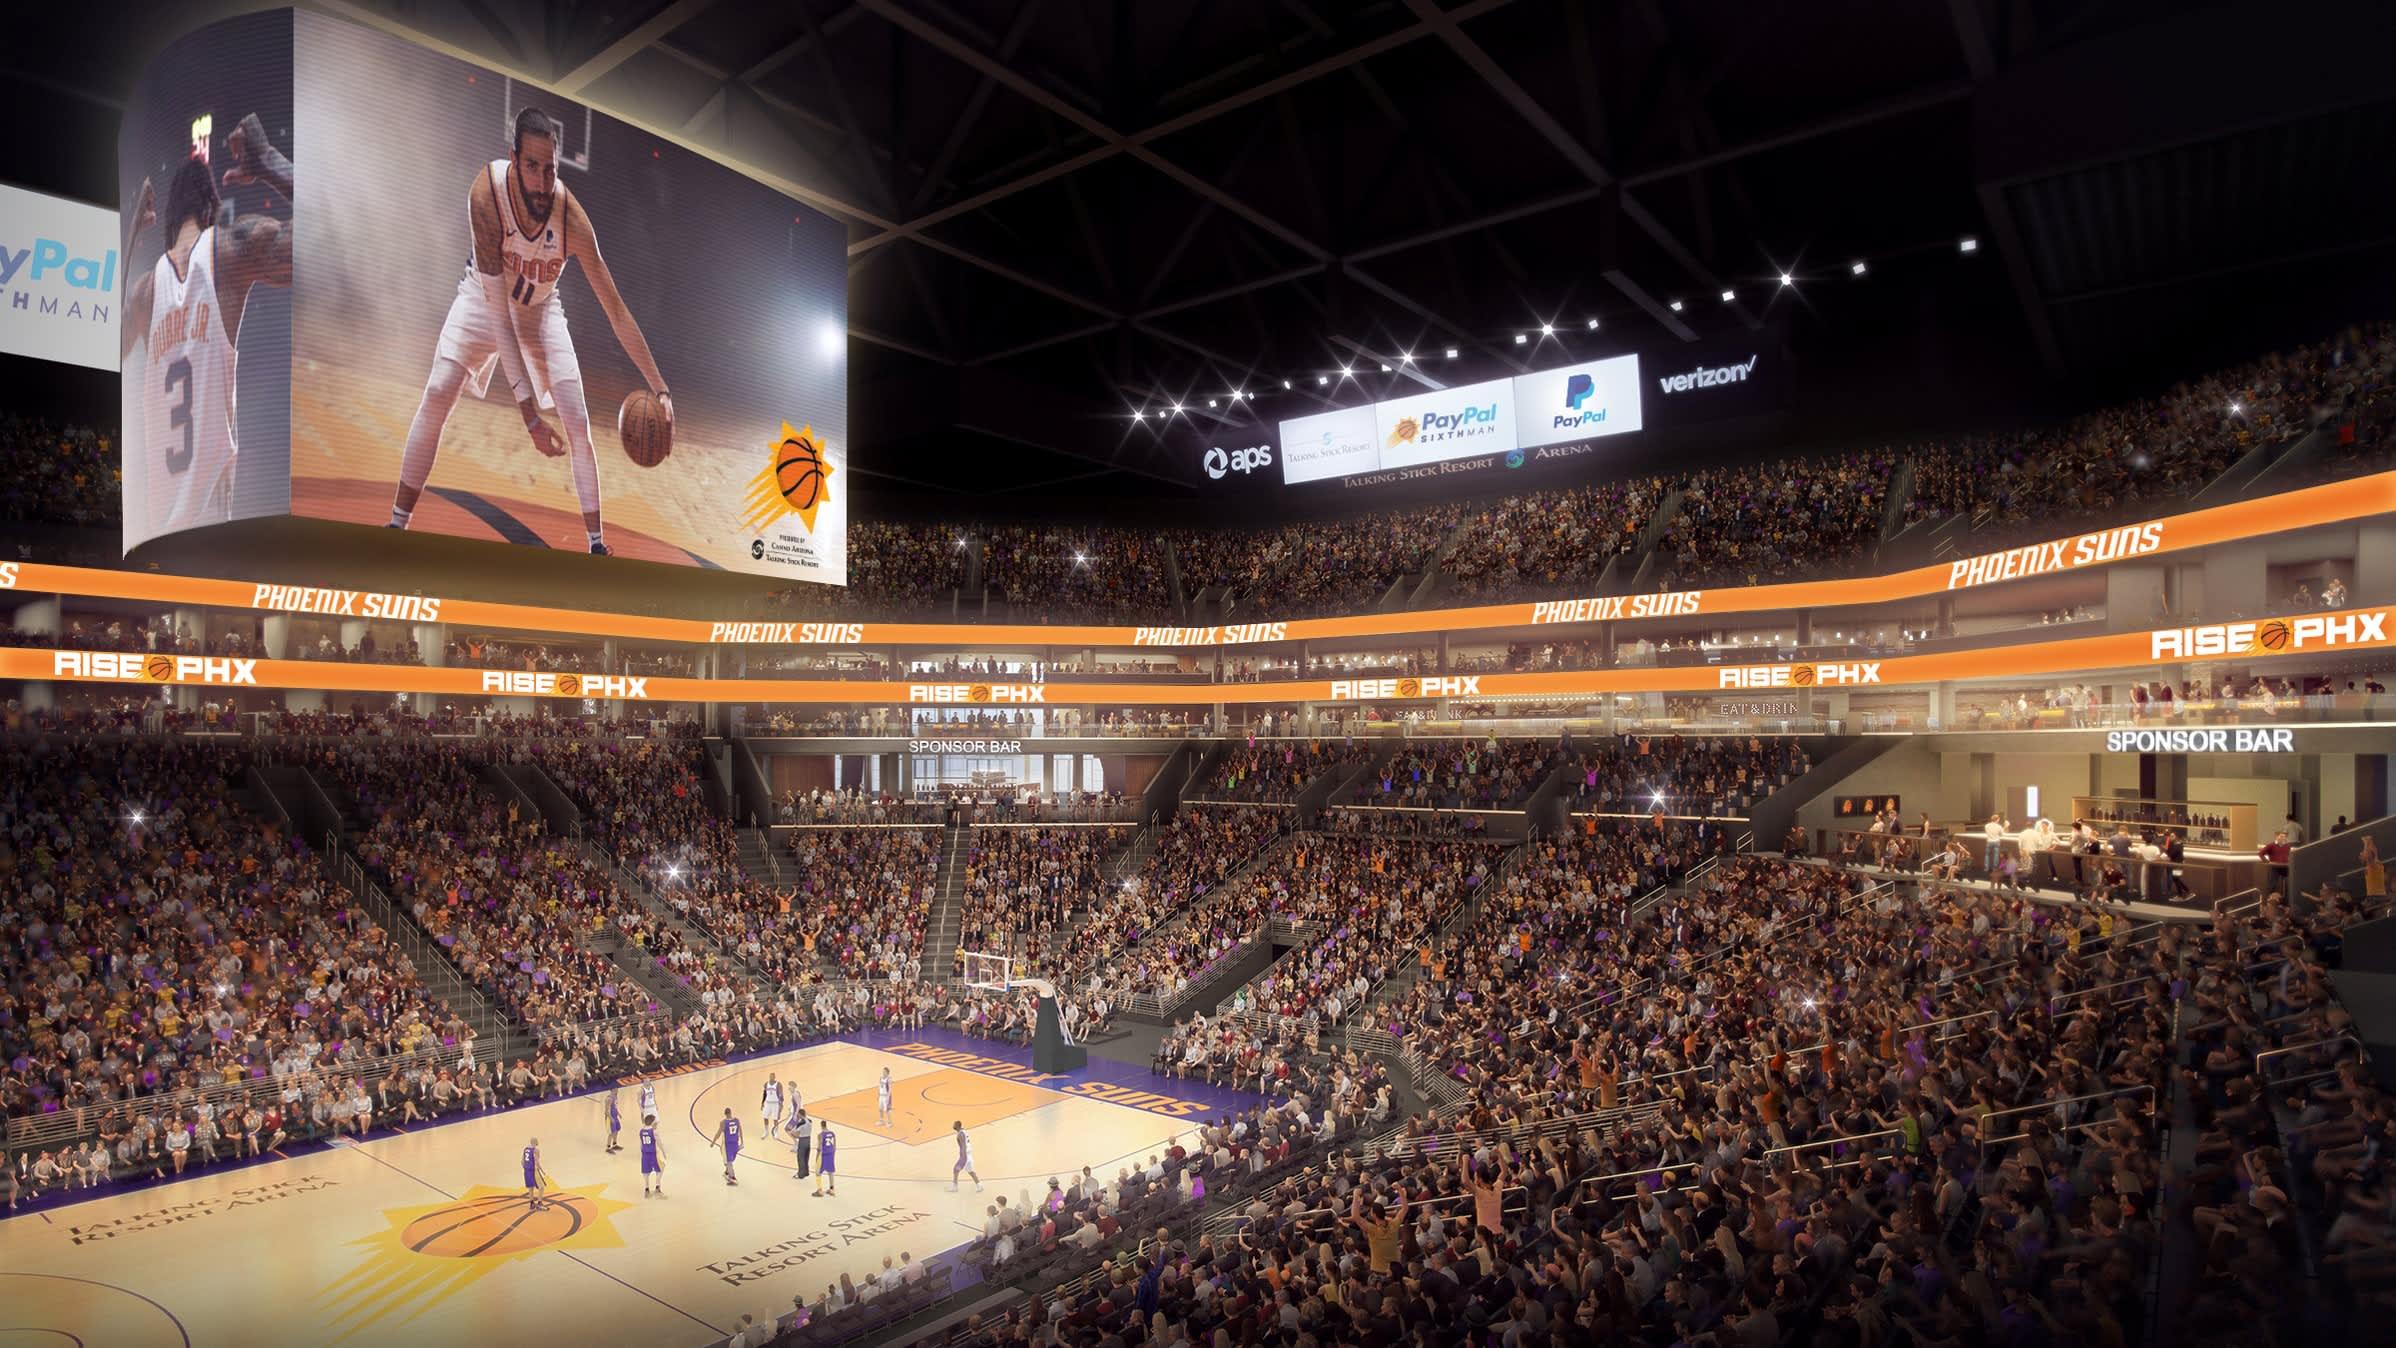 Phoenix Suns unveil renderings of $230 million Talking Stick Resort Arena renovation project